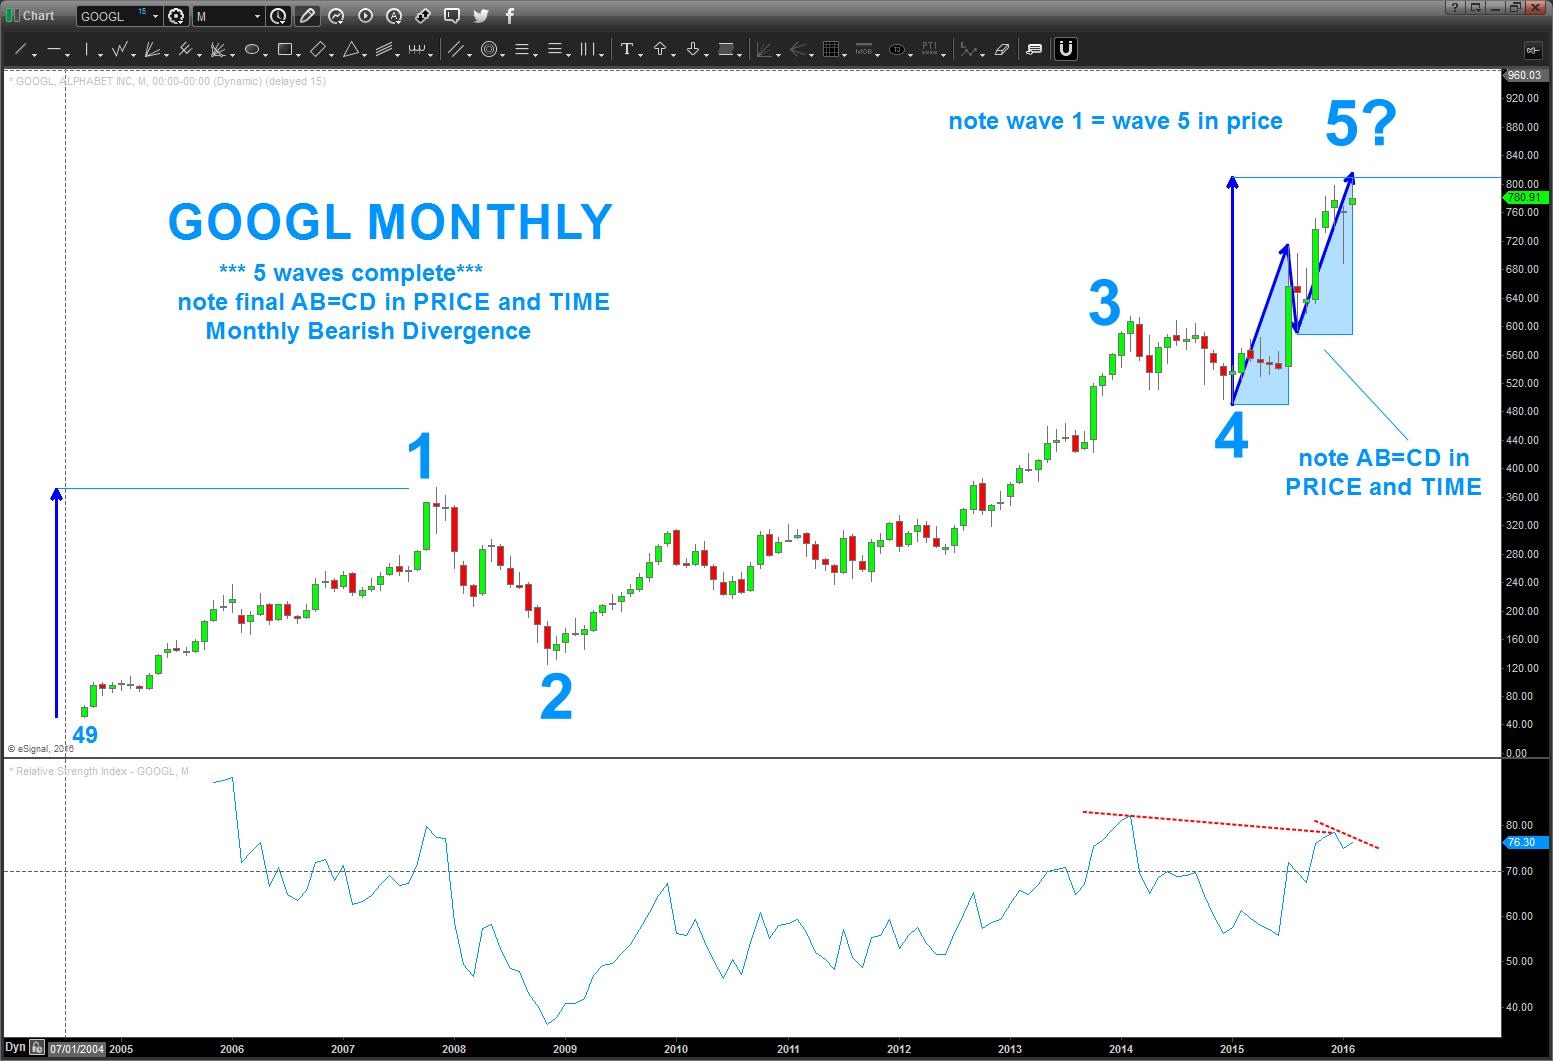 Alphabet Stock Chart Googl Wave 5 Price Target Google February